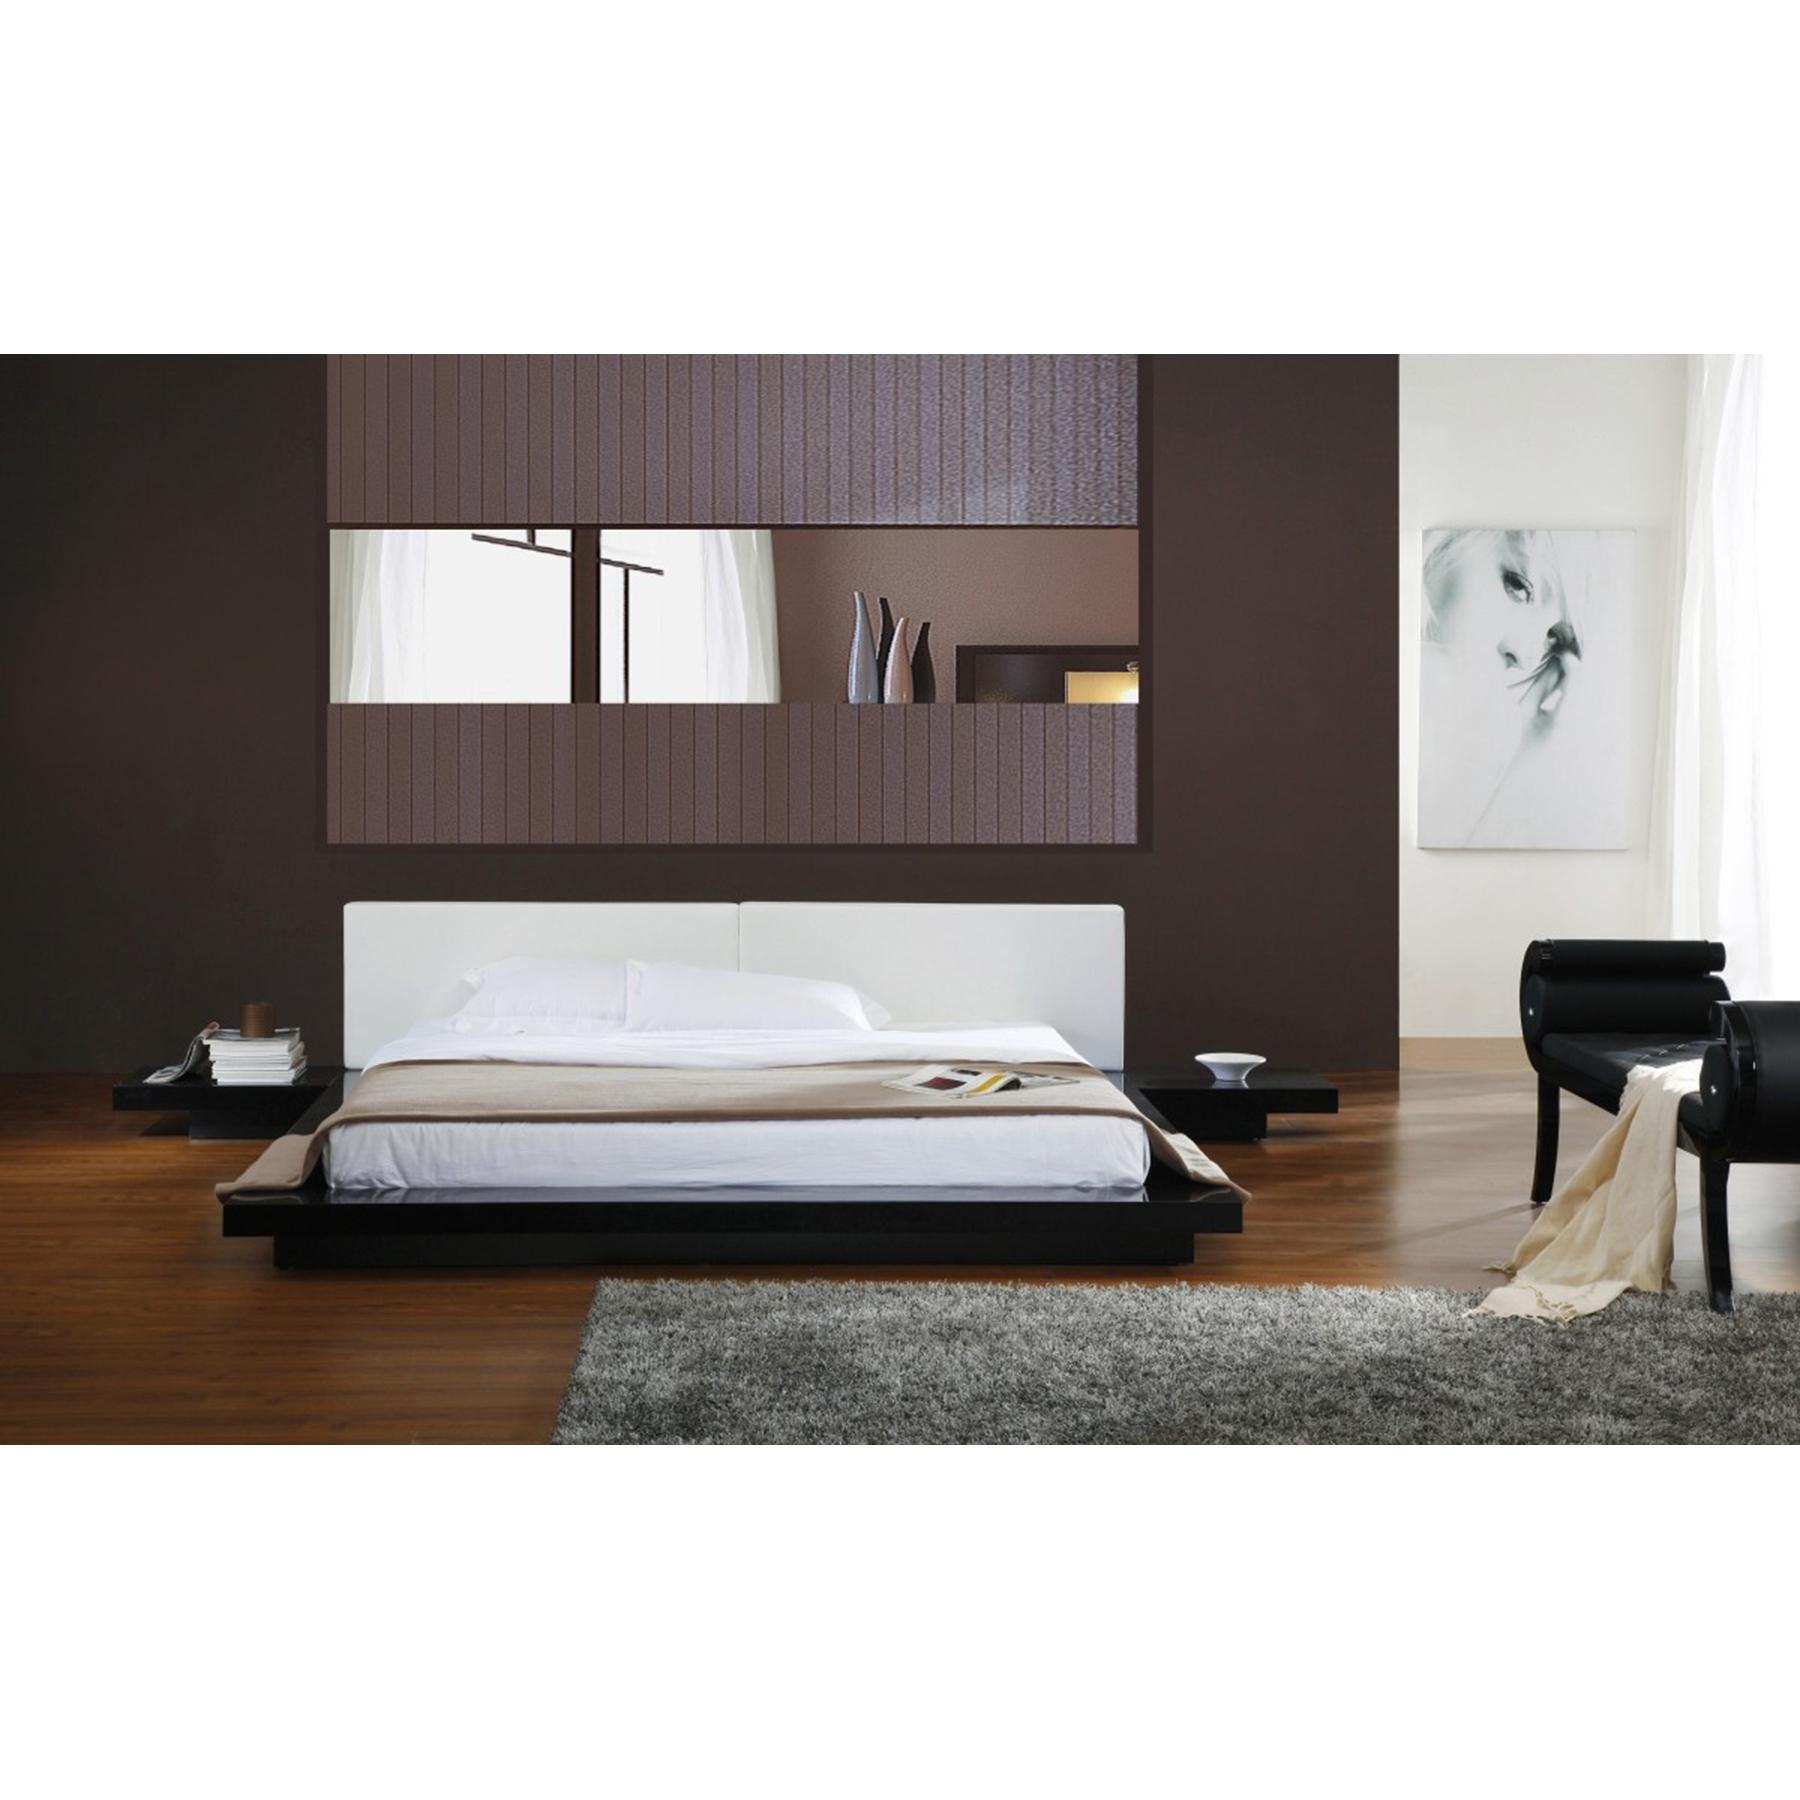 Incroyable Modrest Opal Japanese Style Platform Bed   White, Black Gloss    VIG VGKCOPAL  ...